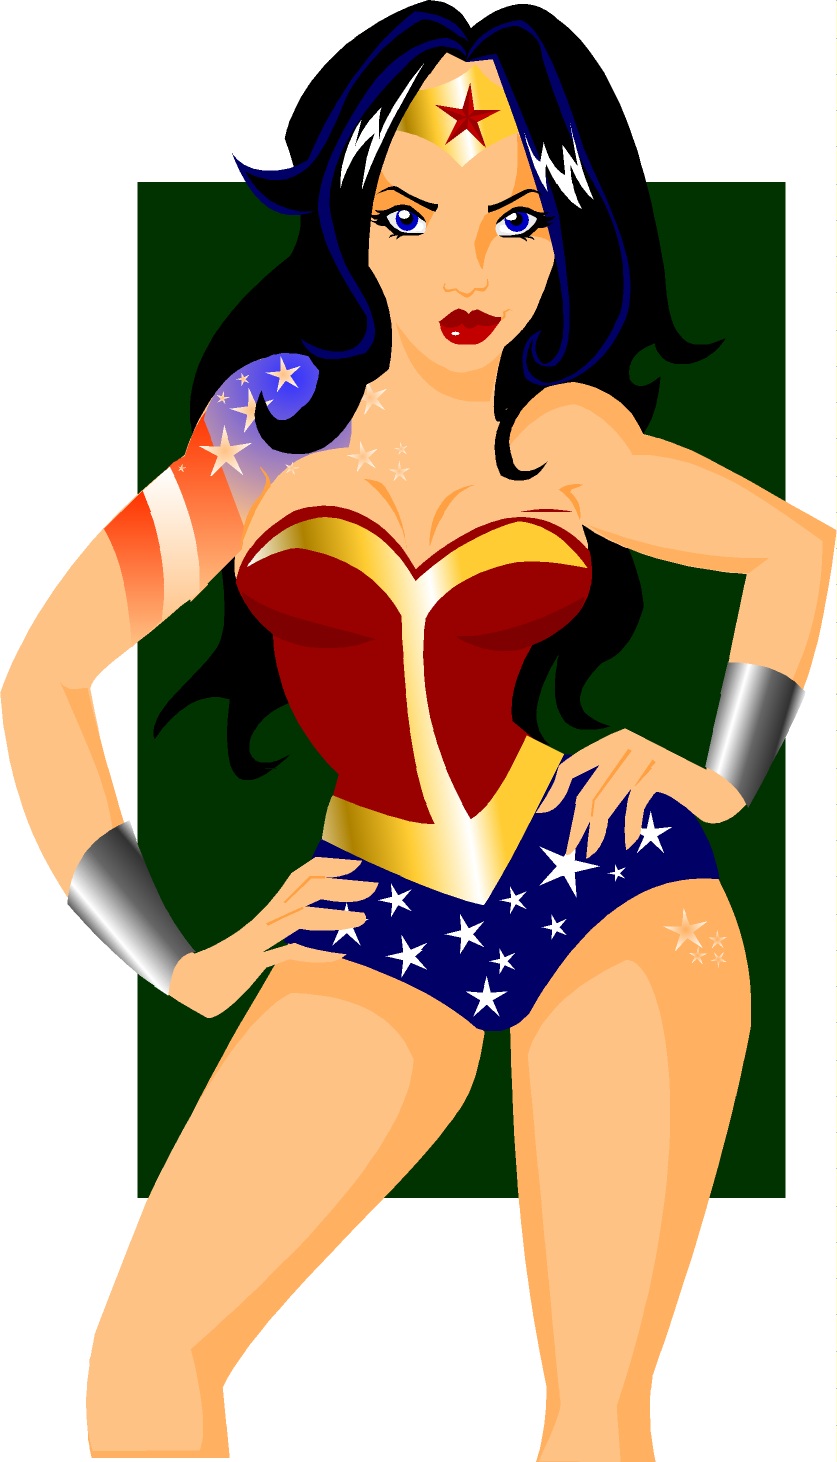 Wonder Woman Tattoos By Pixie The Gator On Deviantart Wonder Woman Tattoo Wonder Woman Superman Wonder Woman